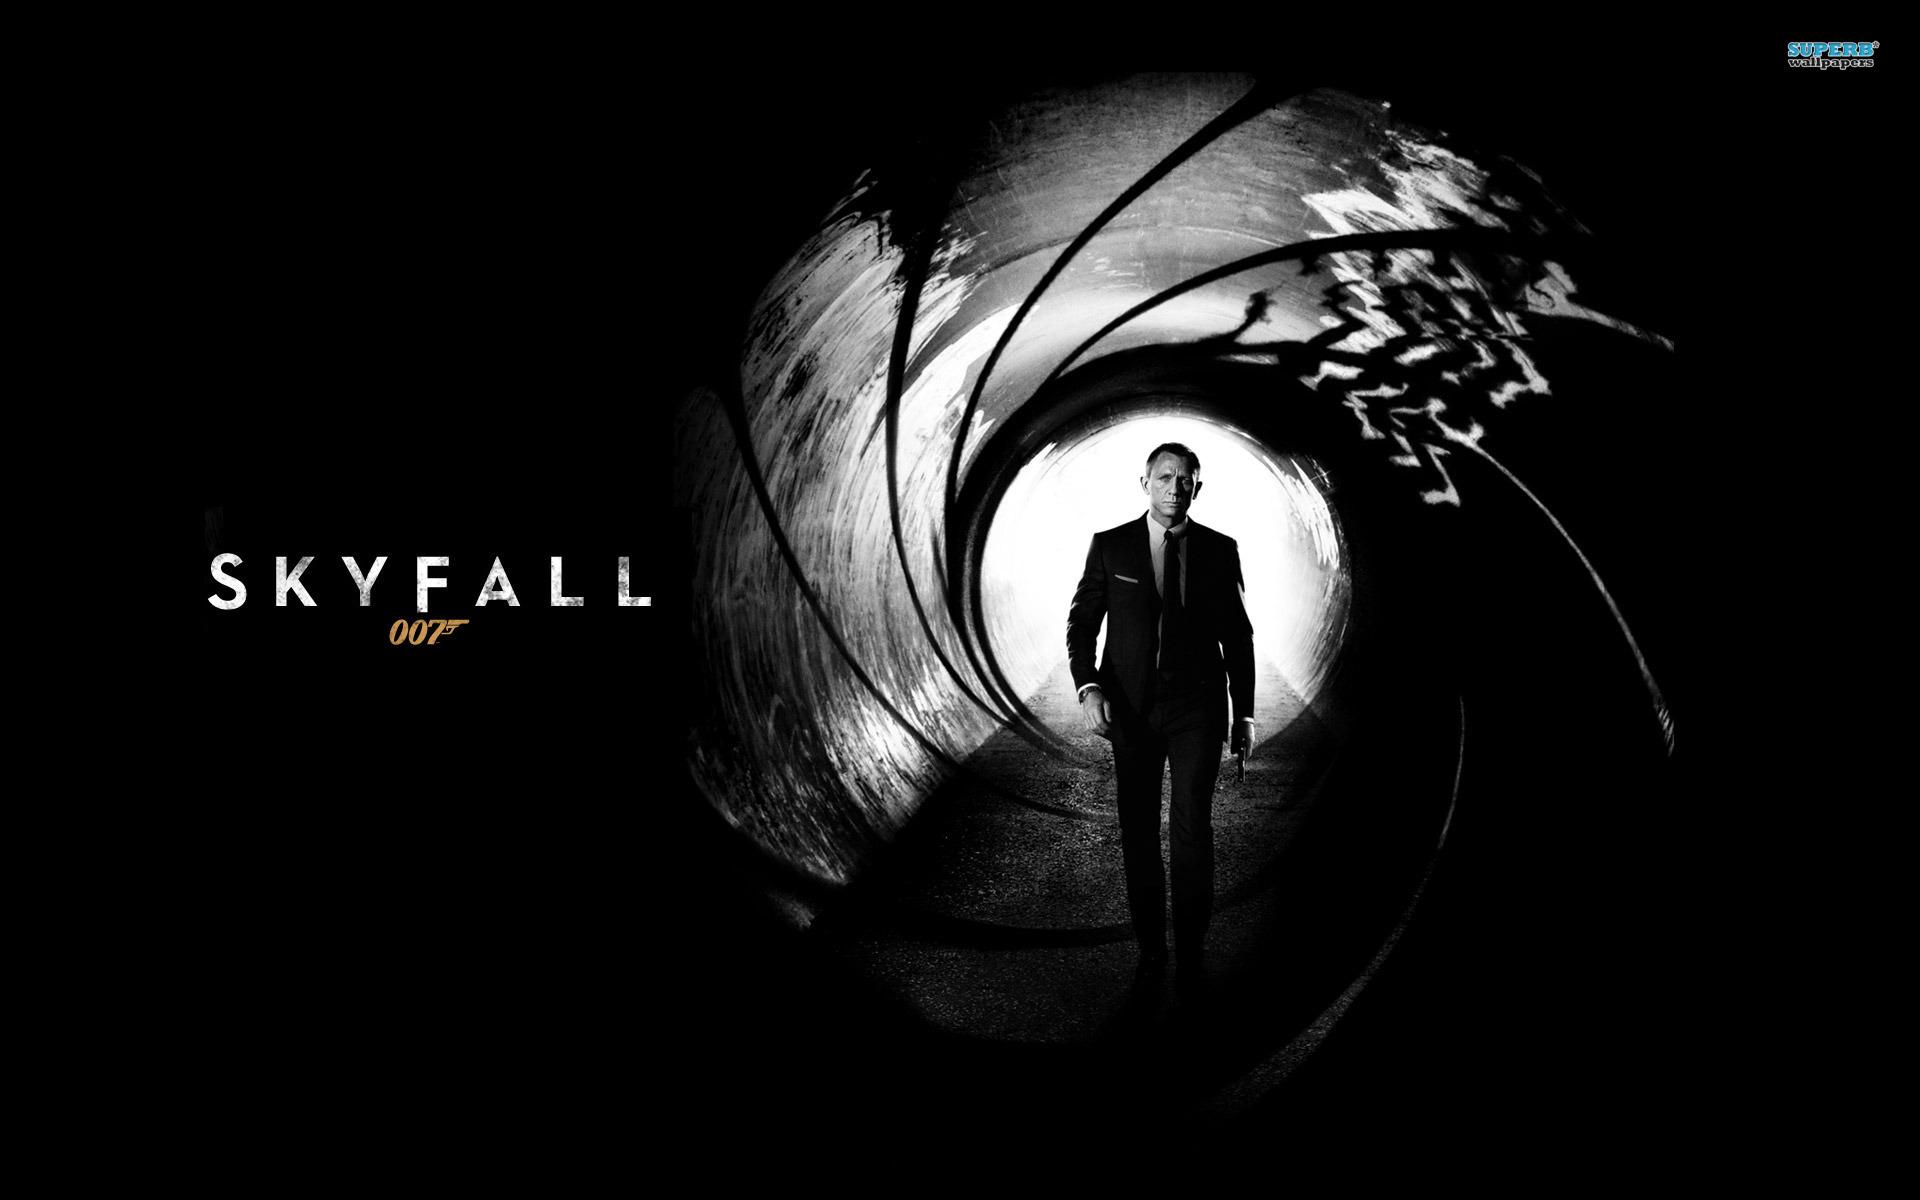 James Bond 007 Skyfall Windows 7 Theme  Download  CHIP